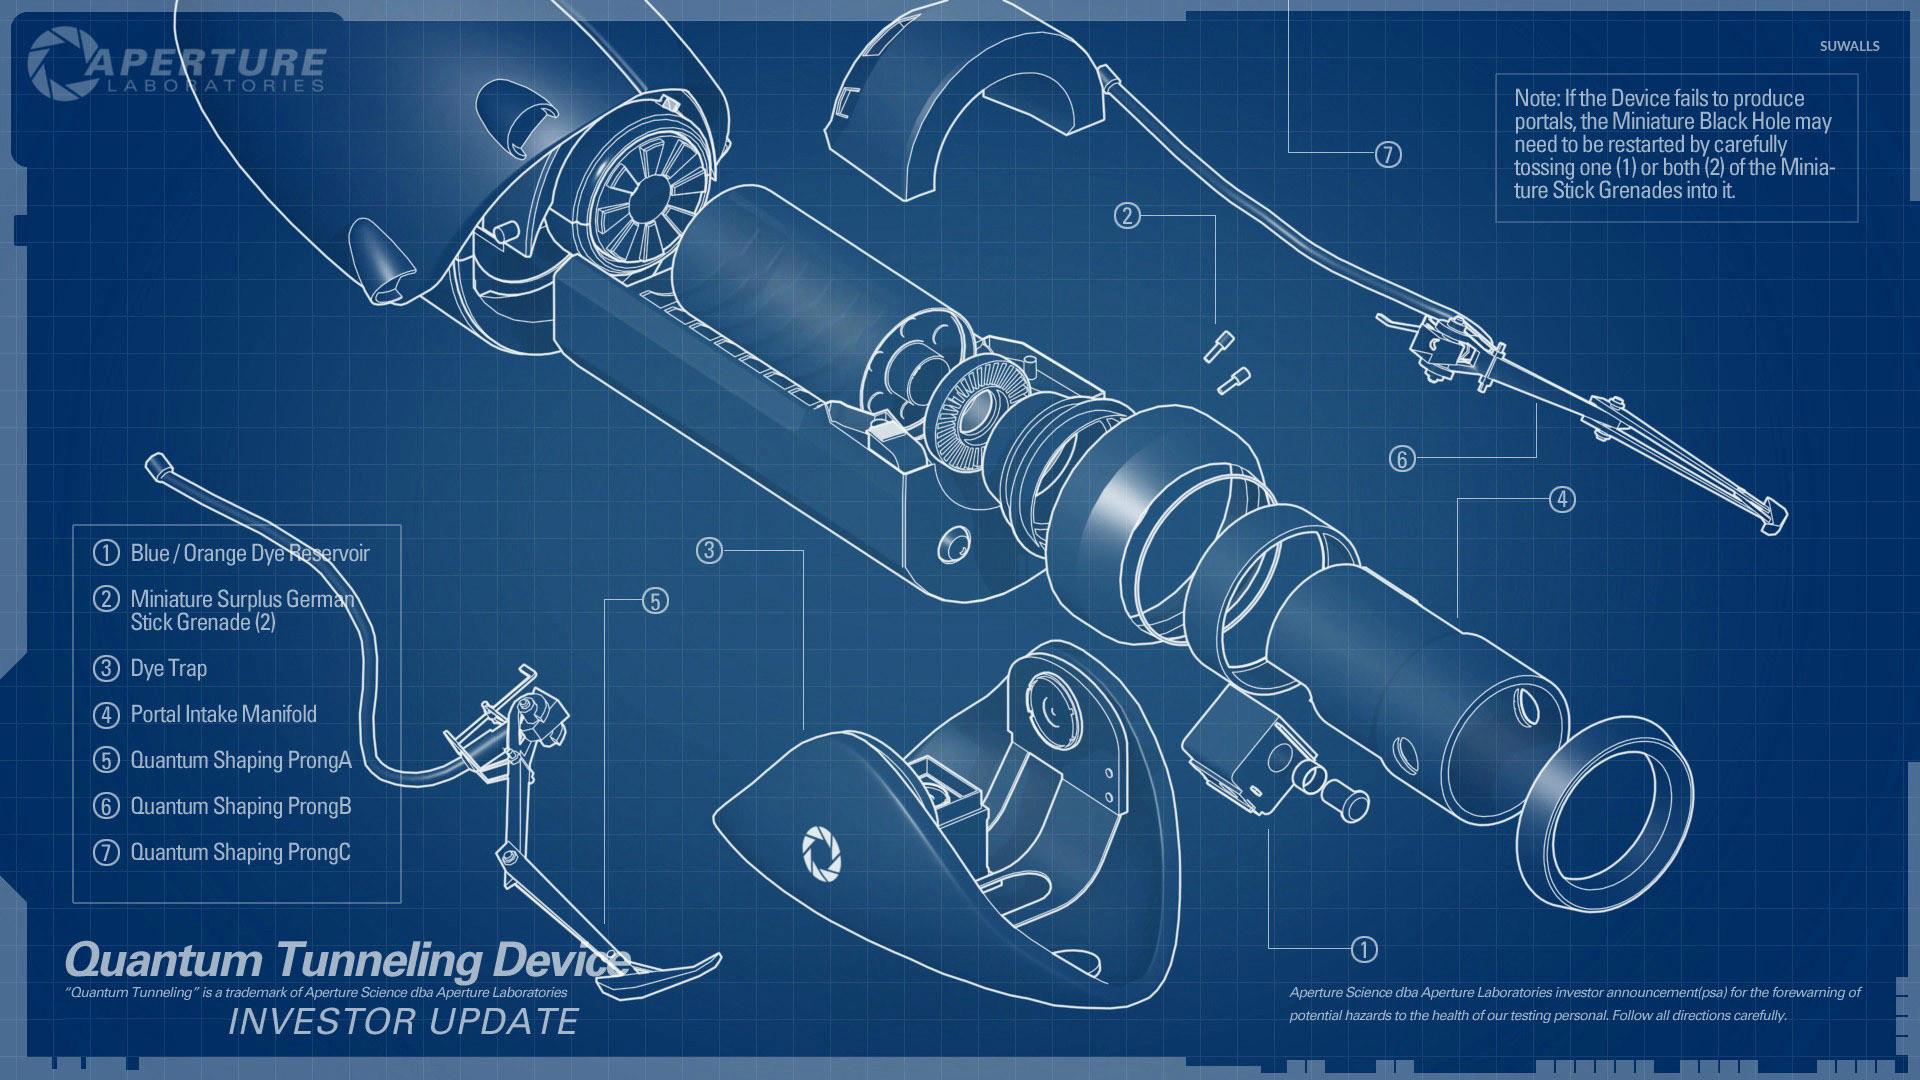 7. aperture-science-wallpaper-HD7-600×338